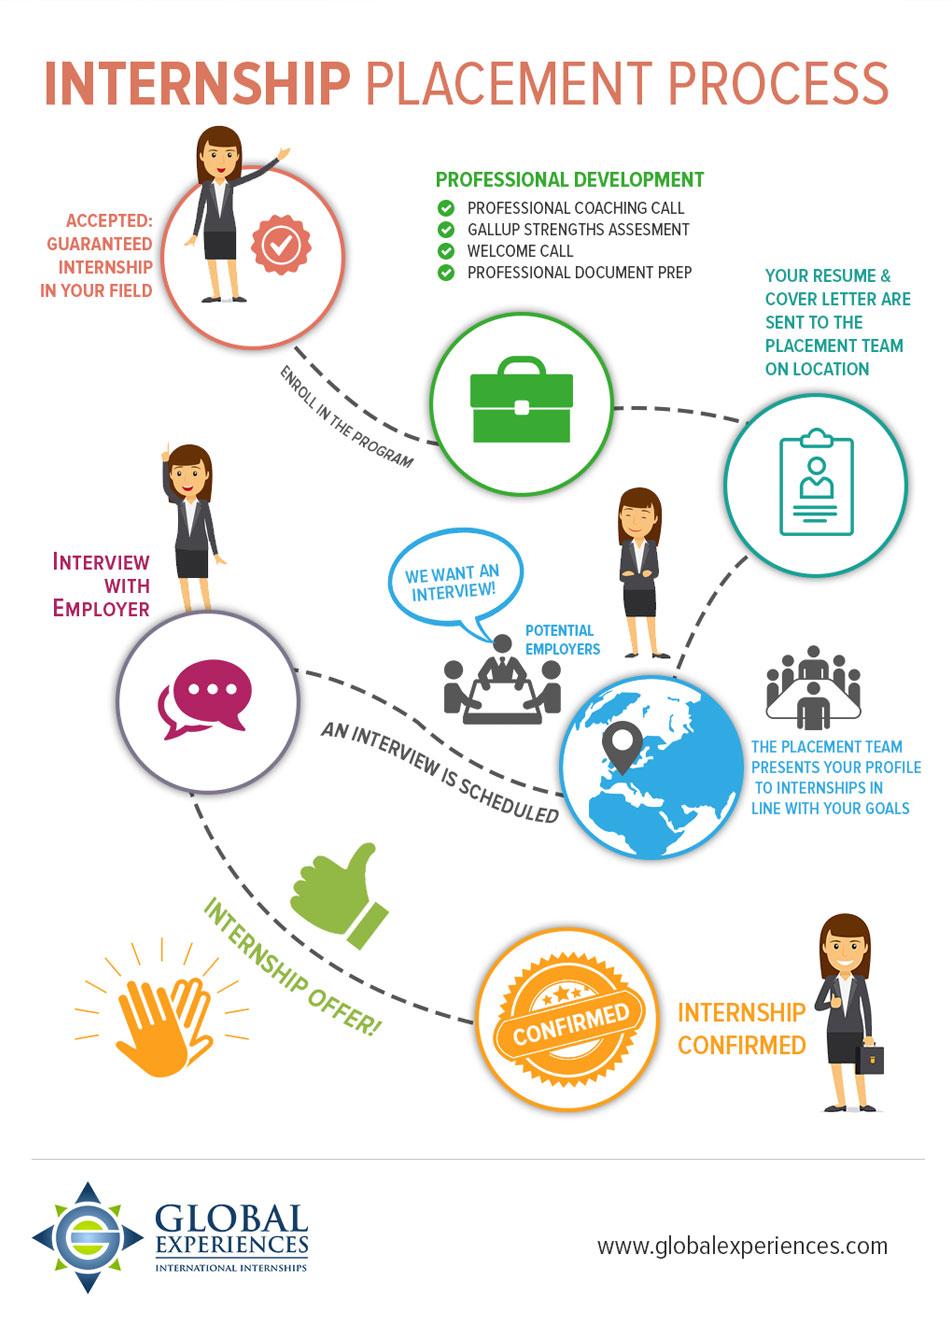 Internship Placement Process Infographic